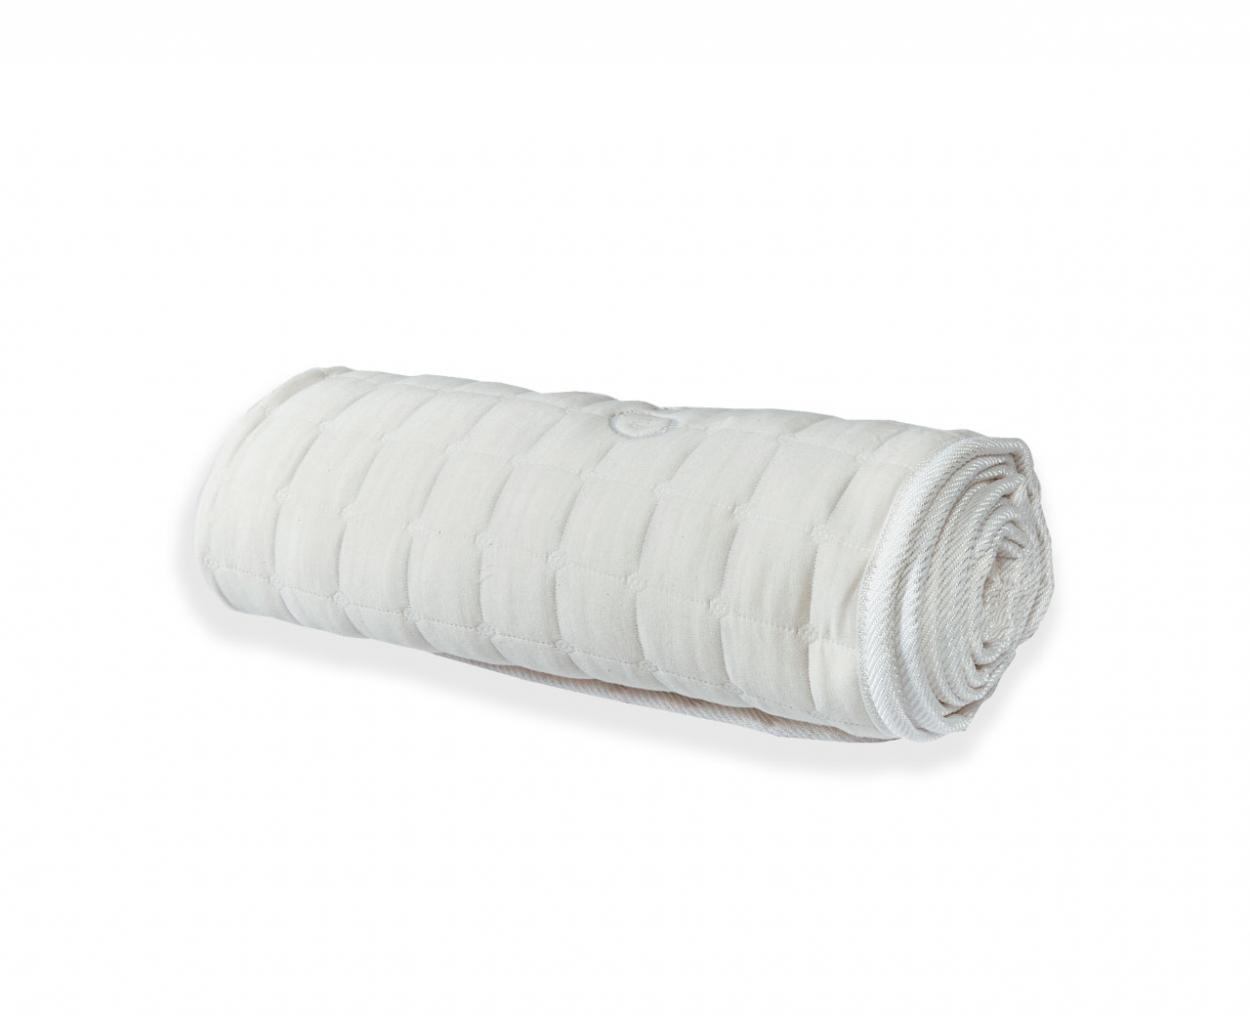 CandiaStrom - Protectors - Organic Cotton